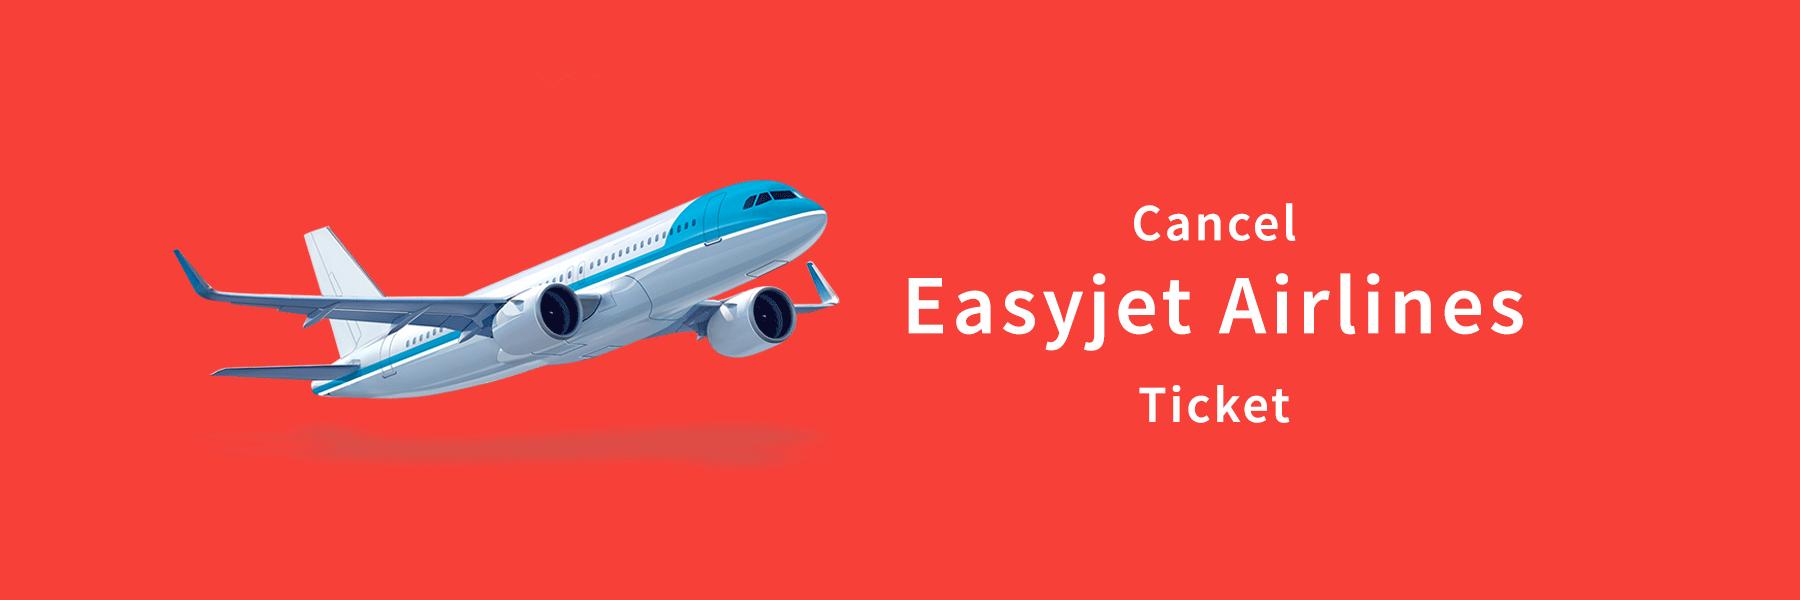 Easyjet Cancellation Process